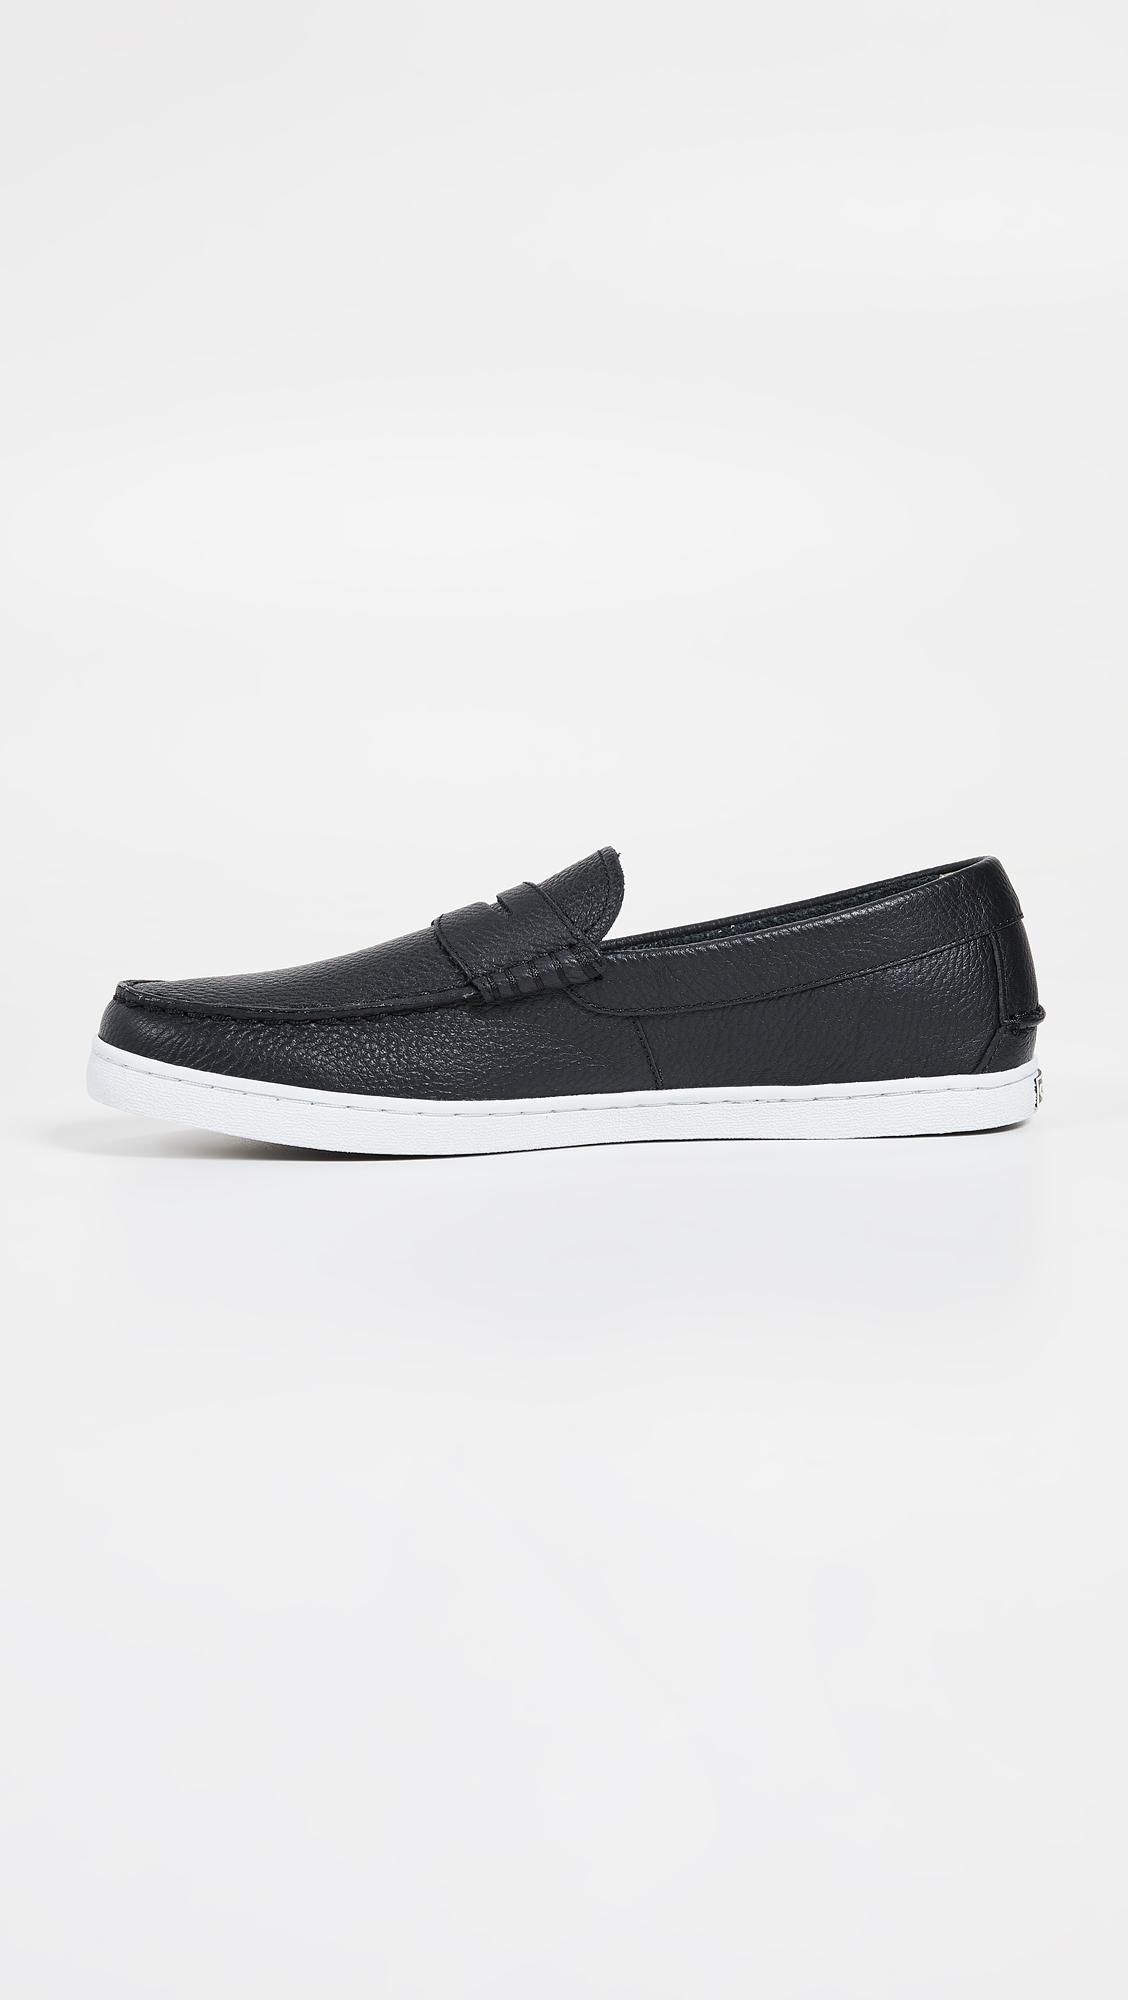 8cb595551ef Cole Haan - Black Pinch Weekender Loafers for Men - Lyst. View fullscreen